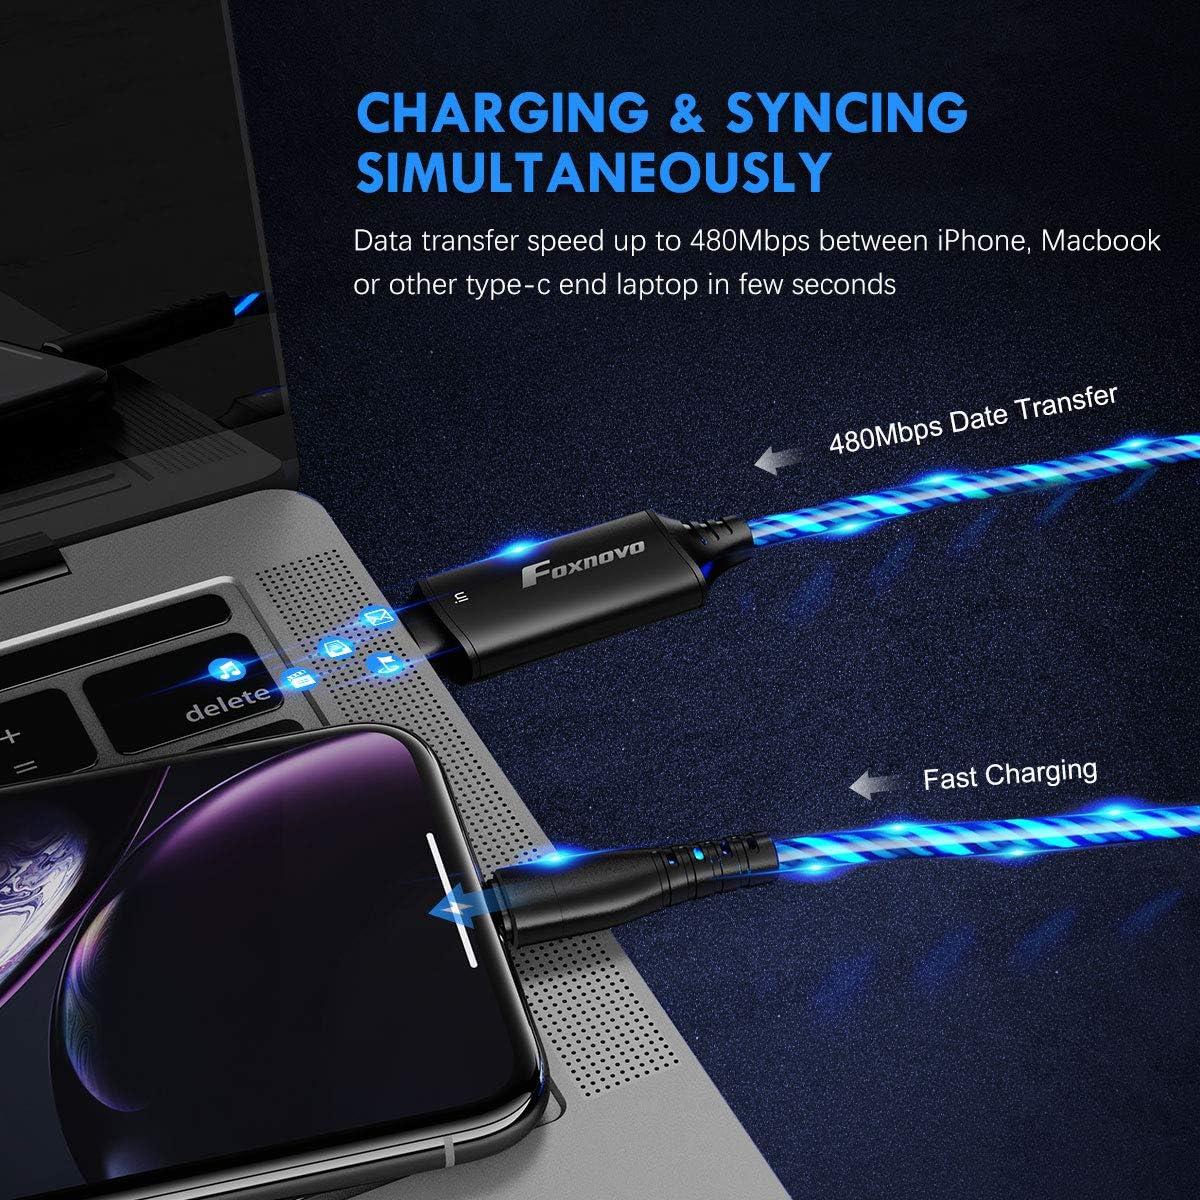 MFi USB C to Lightning EL Flowing Charging Cable, EL Flow Charger Cable Lightning to USB-C Cable (Blue)